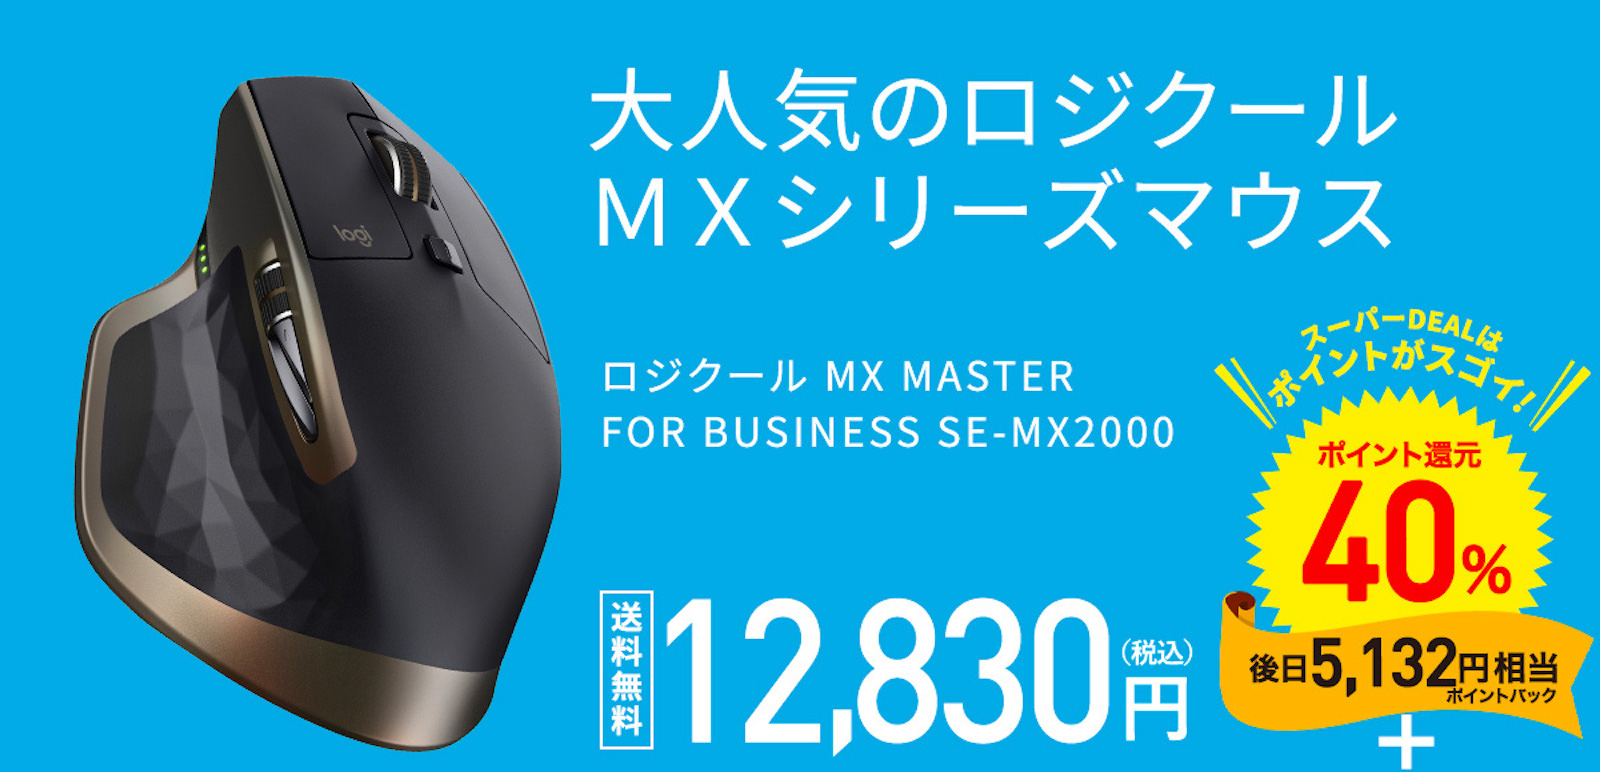 MX-Master-MX2000-Sale.jpg